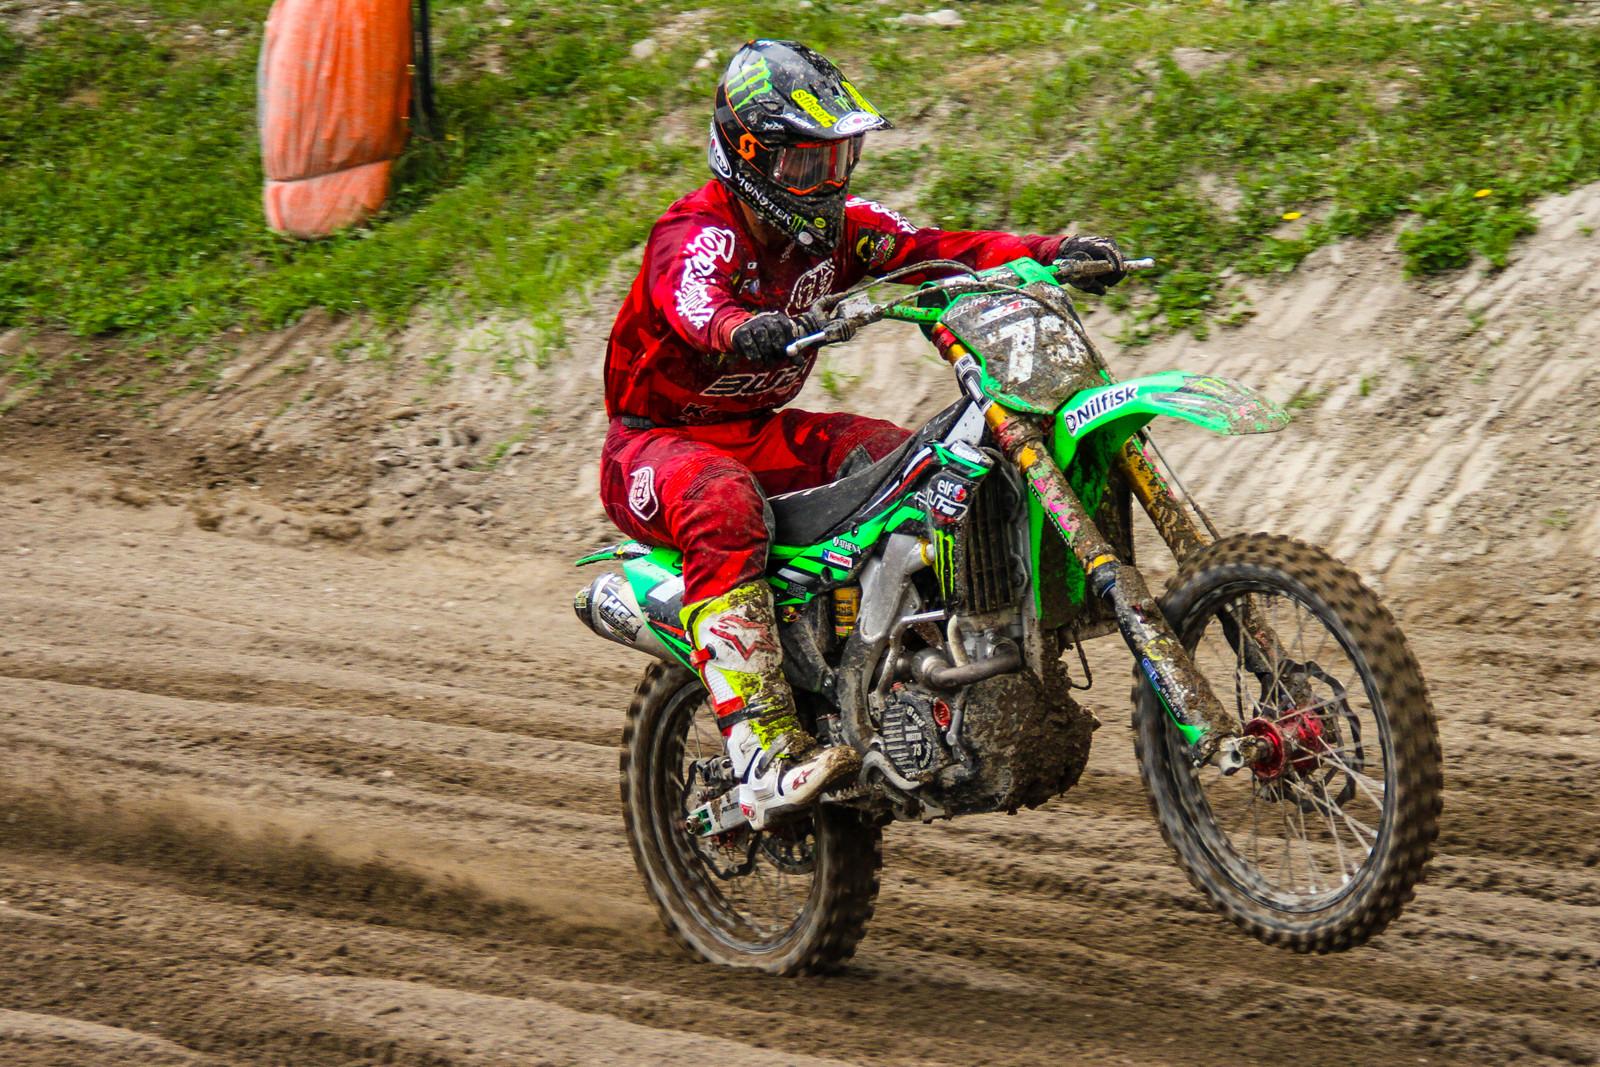 Marshal Weltin - Photo Blast: 2017 MXGP of Trentino - Motocross Pictures - Vital MX